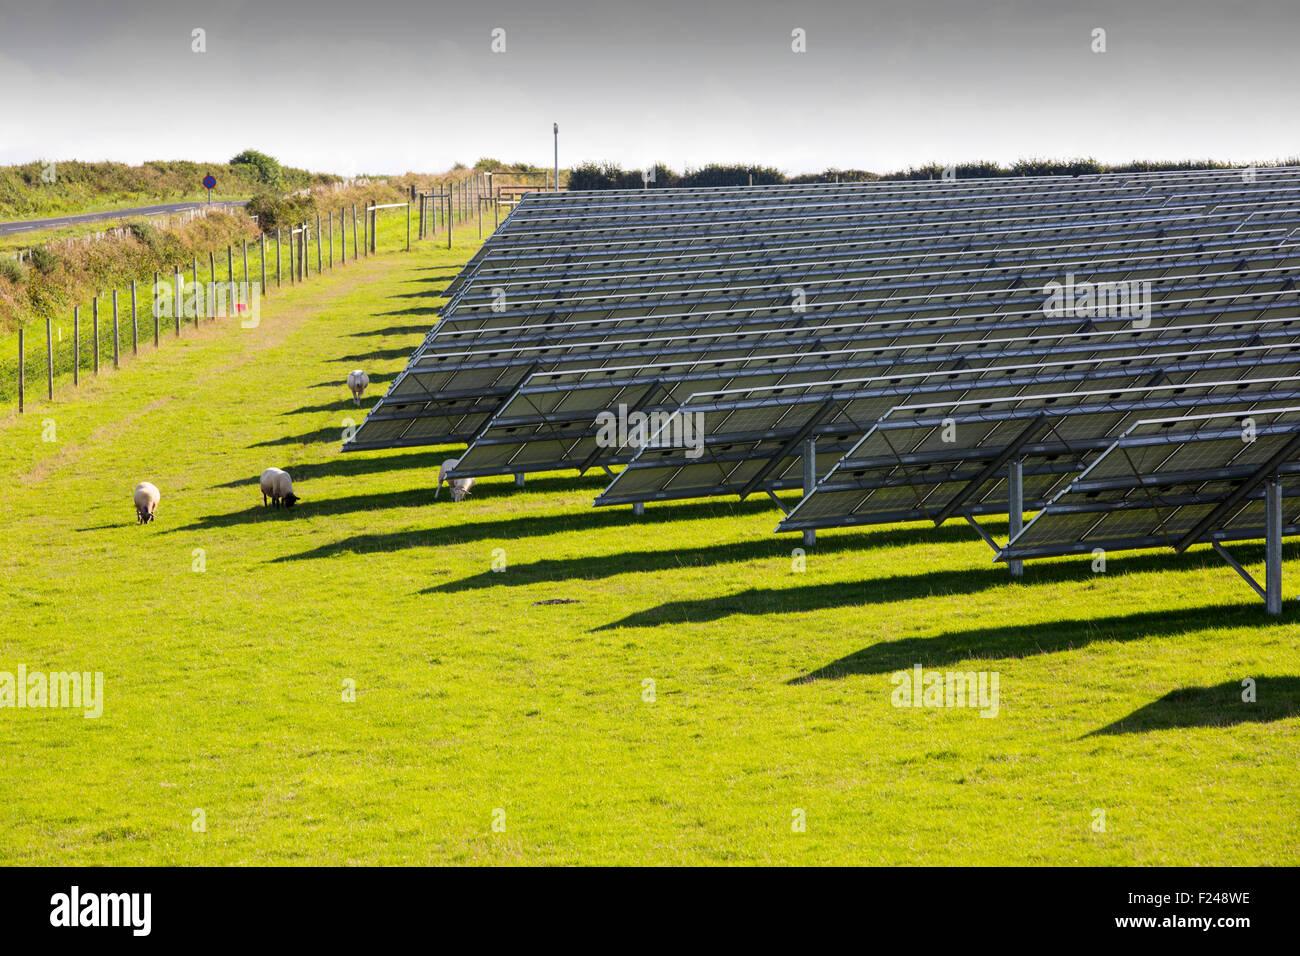 A farm based solar plant near wadebridge, Cornwall, UK, - Stock Image